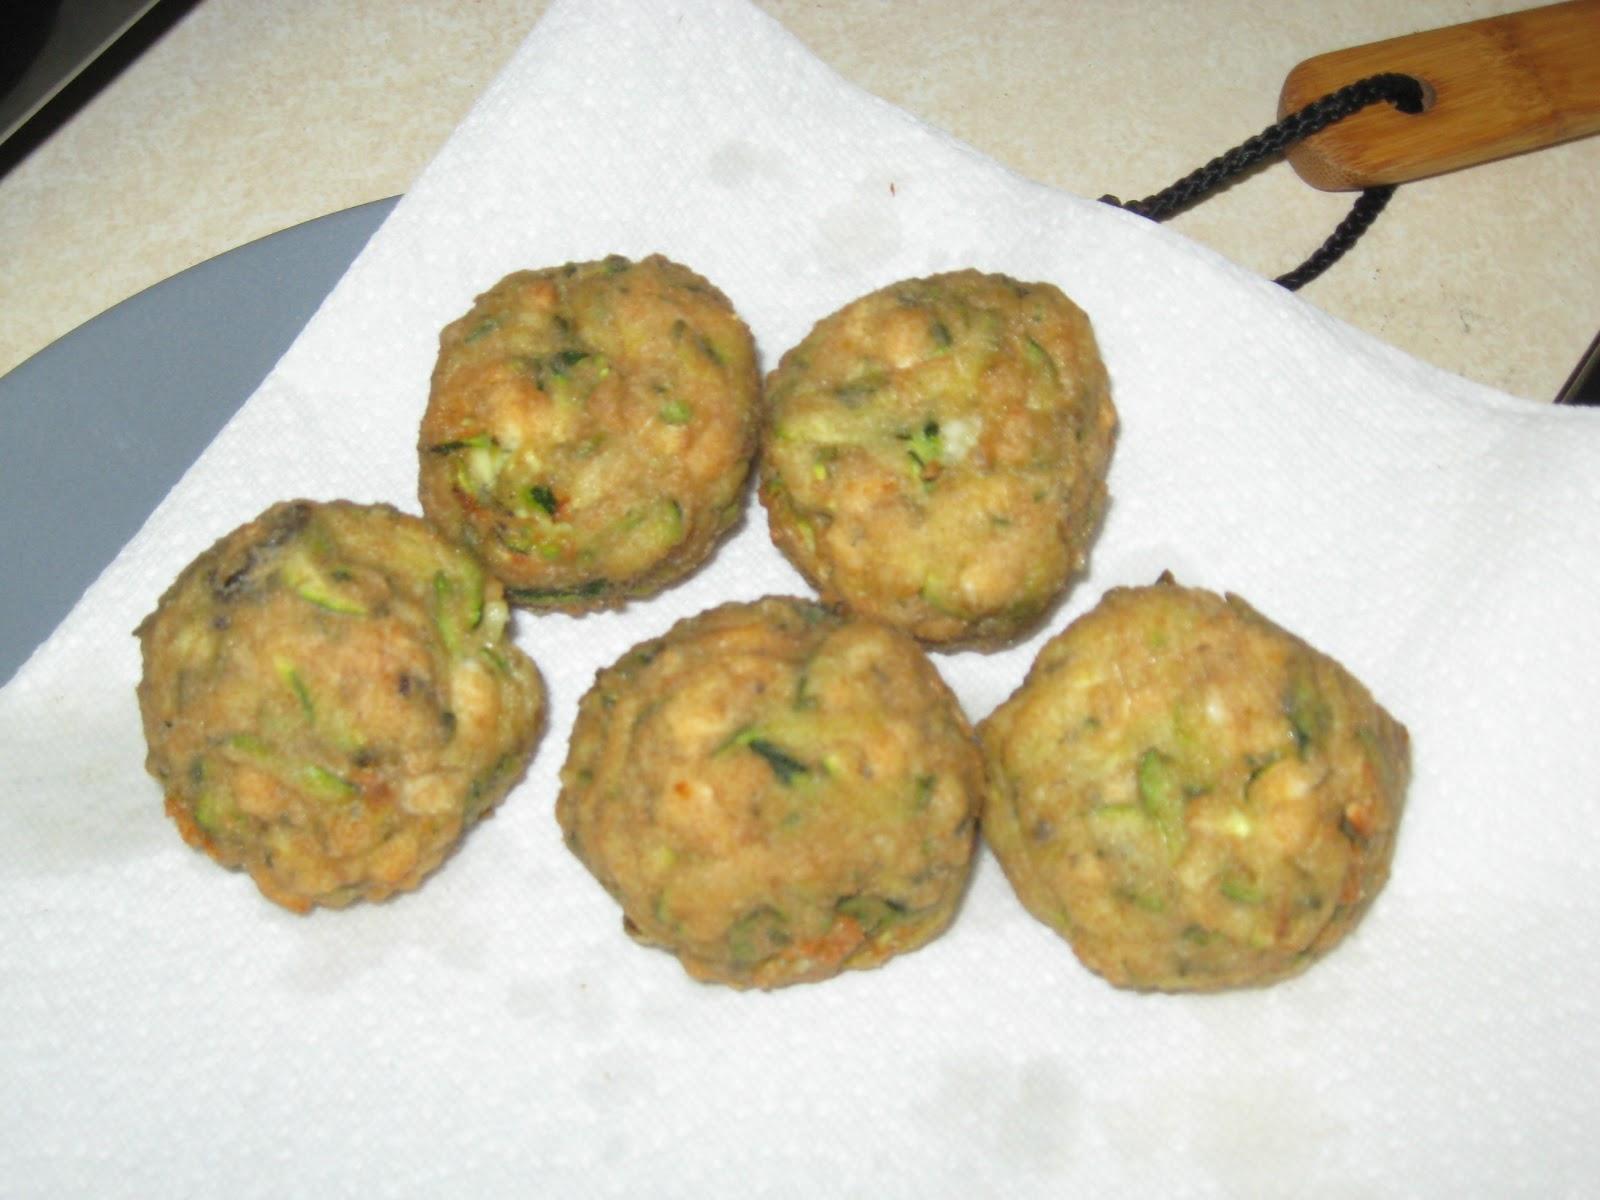 Courtney's Recipes: Kolokythokeftedes (Zucchini & Feta Balls)